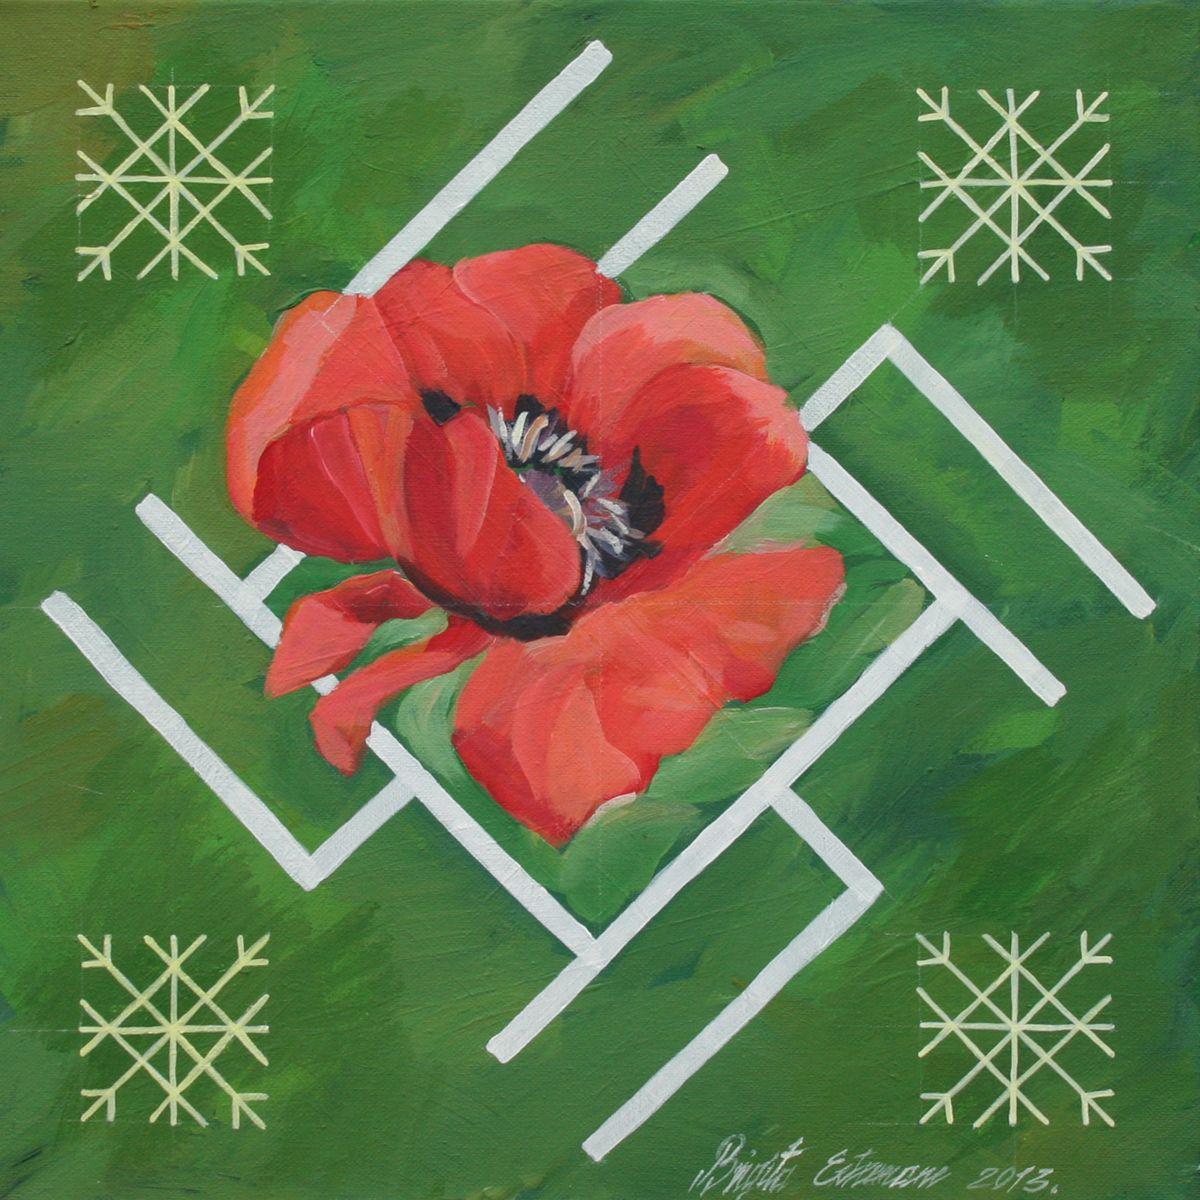 Traditional Latvian folk symbols with a poppy blossom on green. Acrylic on canvas, 40x40cm.